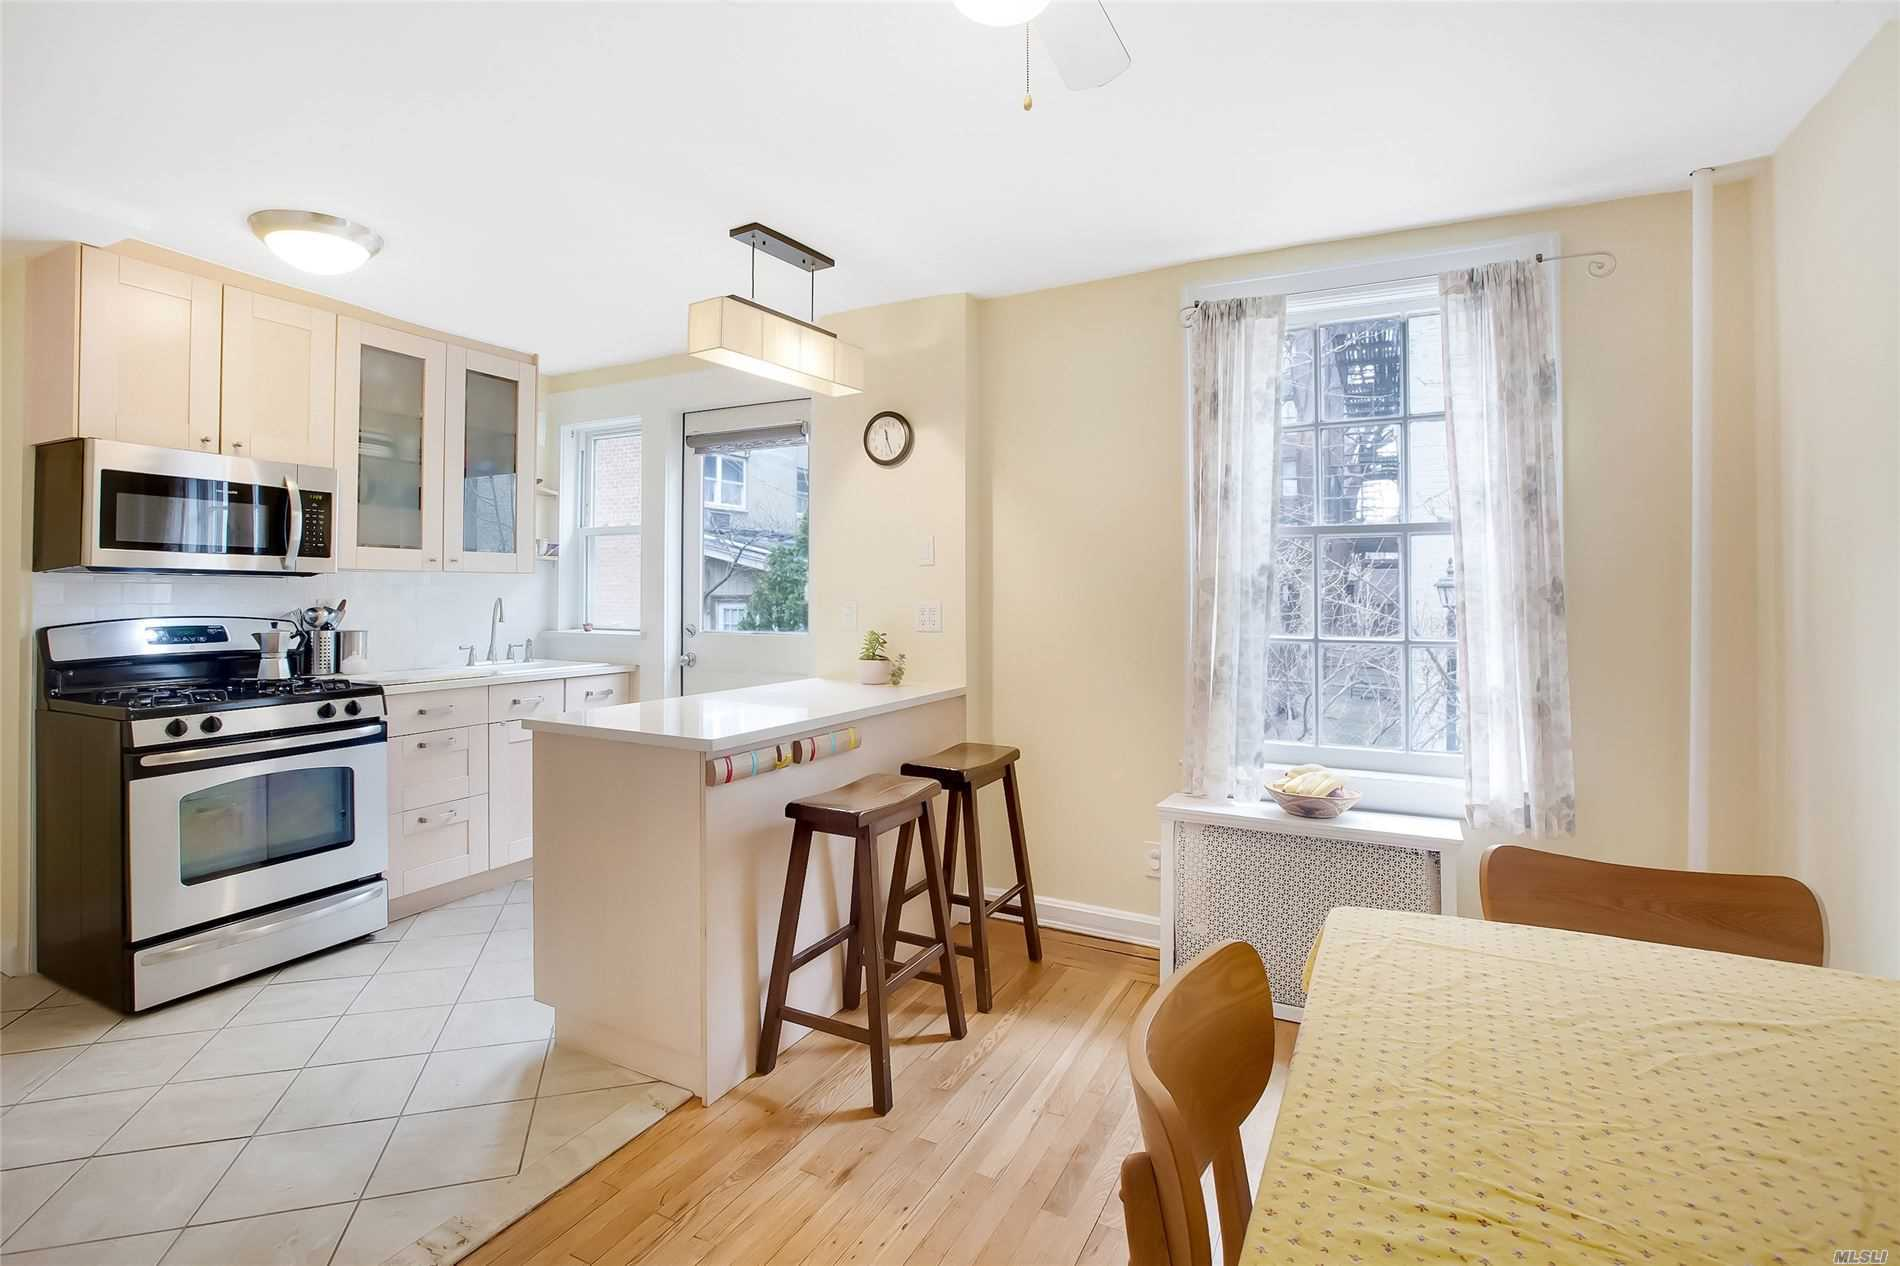 Property for sale at 40-25 48th St, Sunnyside NY 11104, Sunnyside,  New York 11104